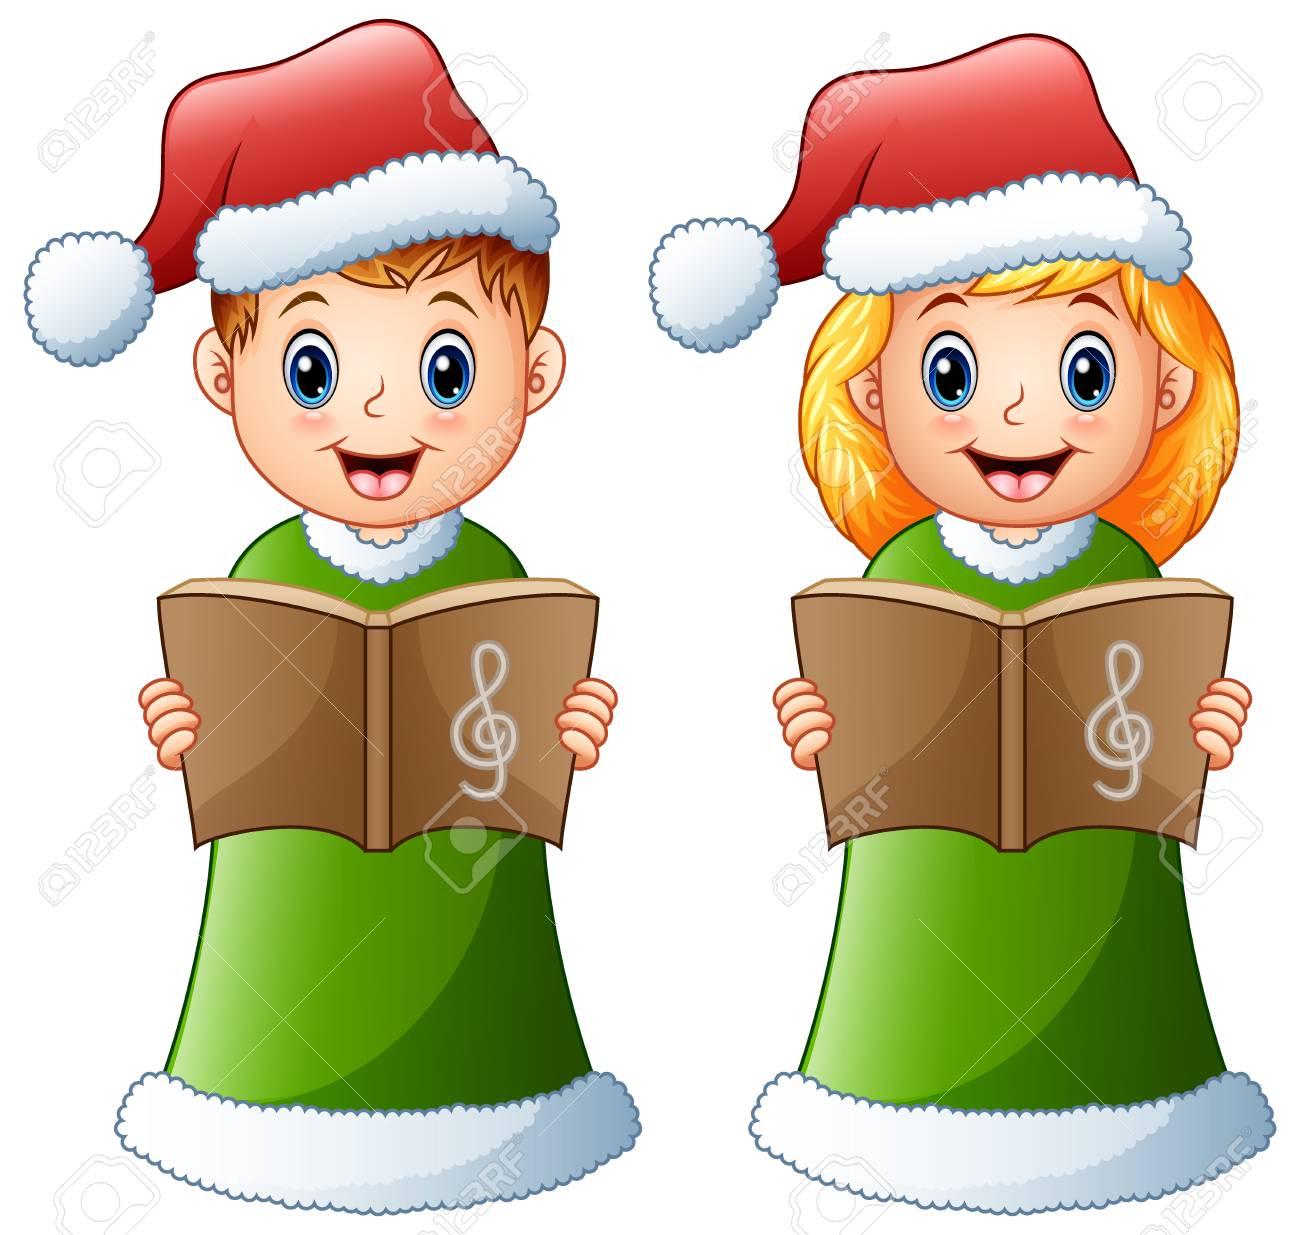 Happy Kids In Green Santa Costume Singing Christmas Carols Stock ...